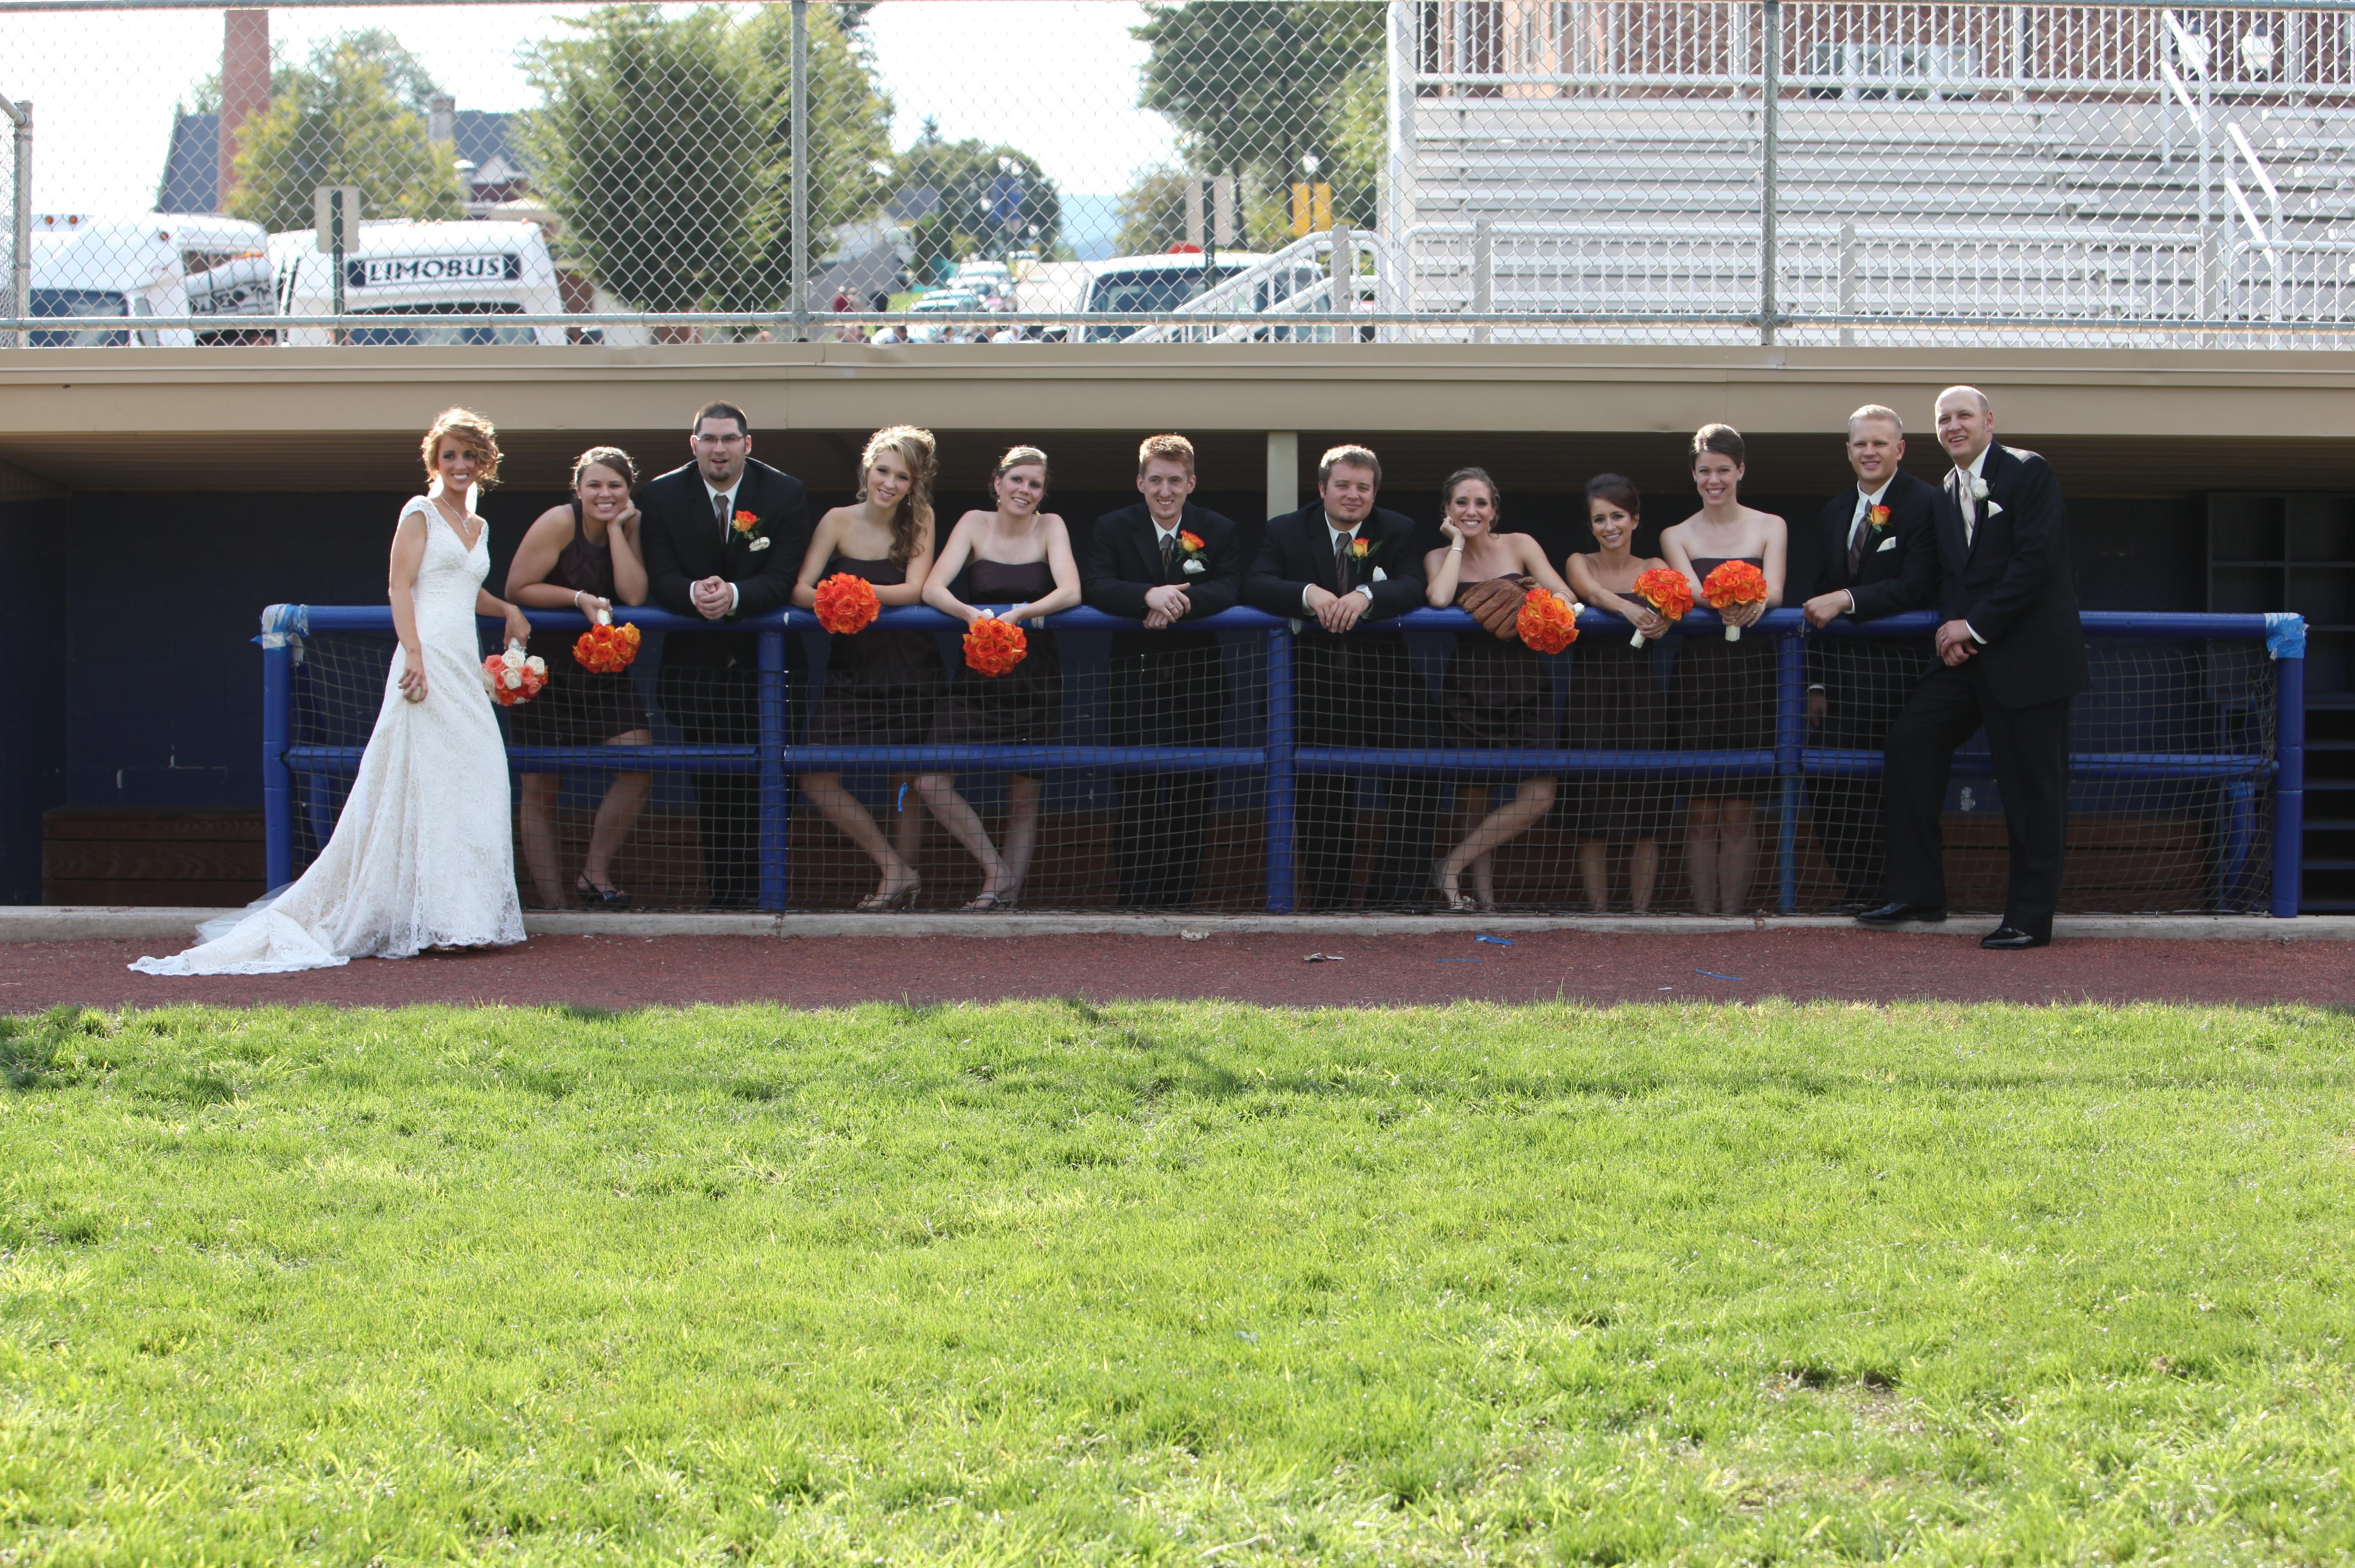 Backlit Bridal Party In Baseball Dugout Ruth E Hendricks Photography